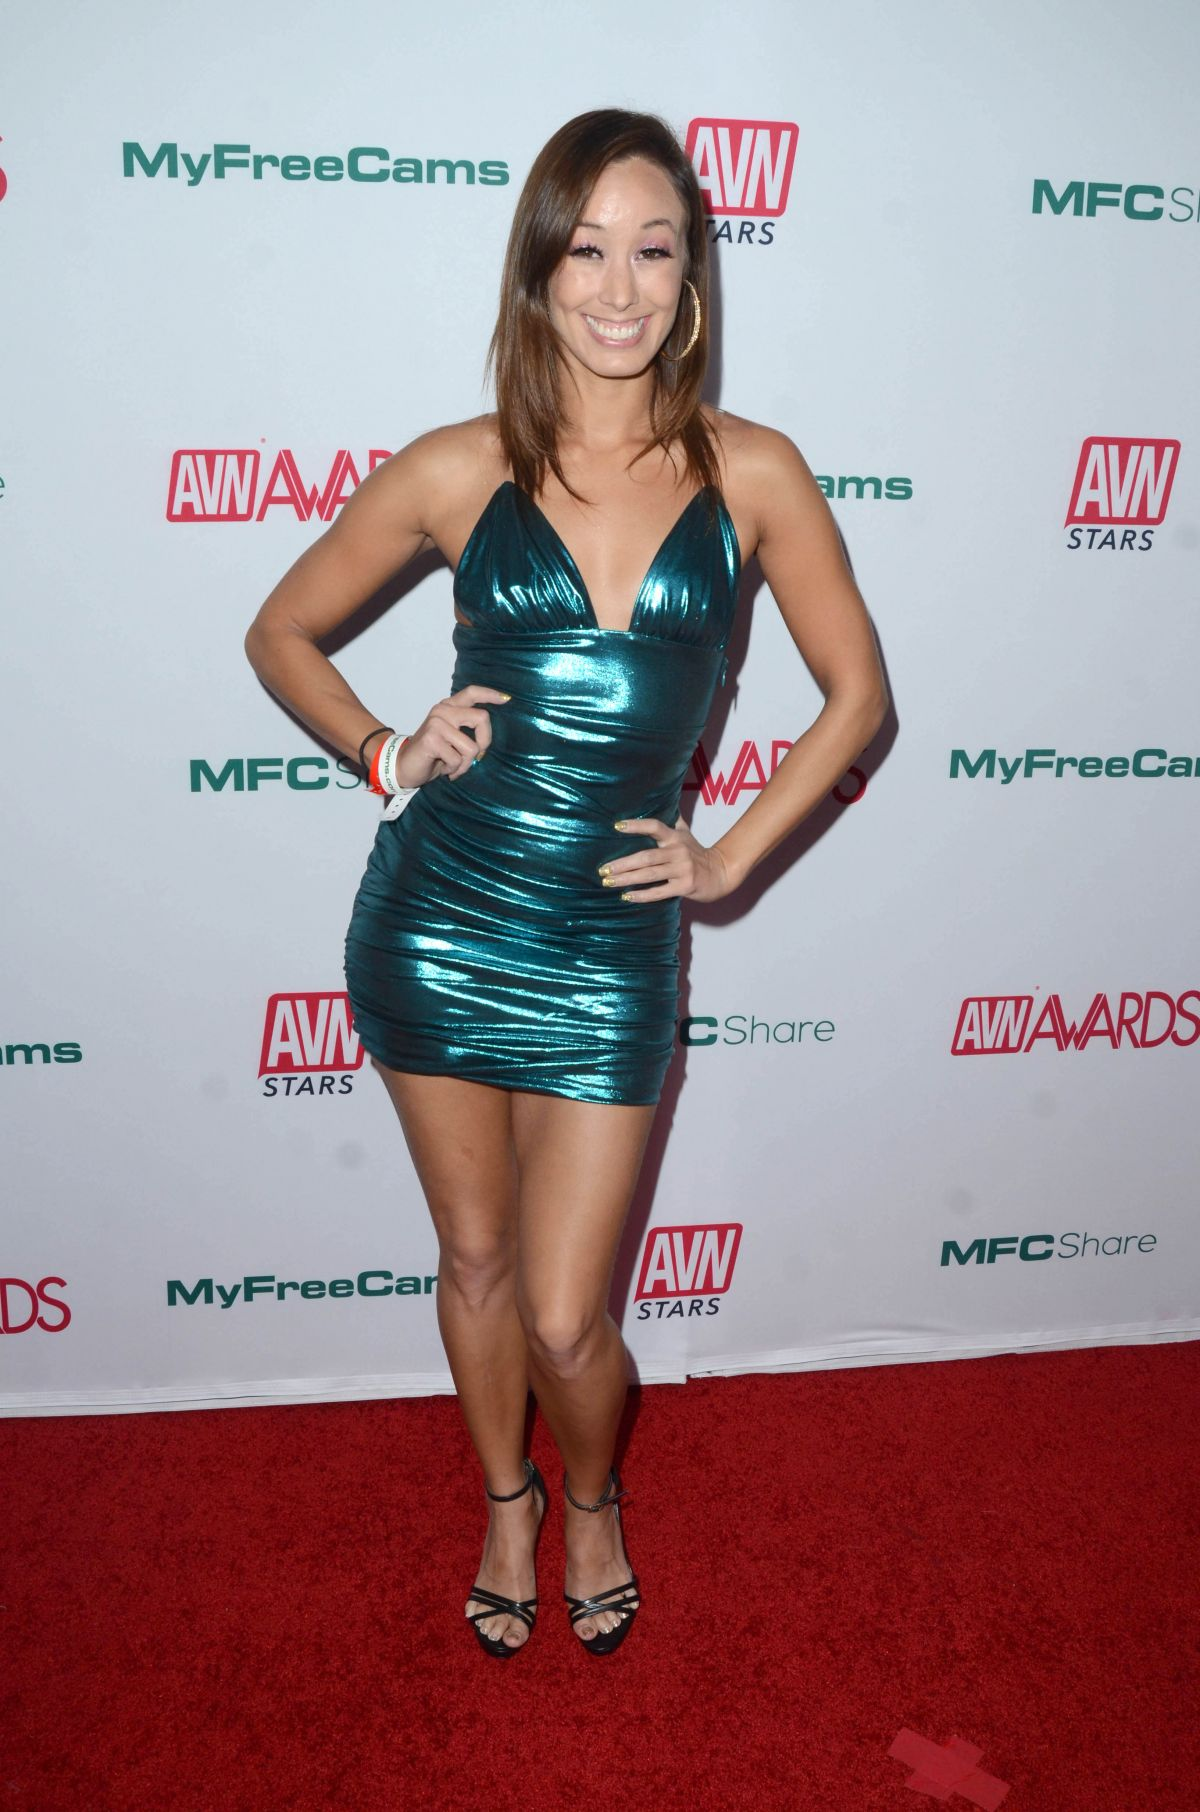 Cali Carter - AVN Awards 2016 in Las Vegas   GotCeleb